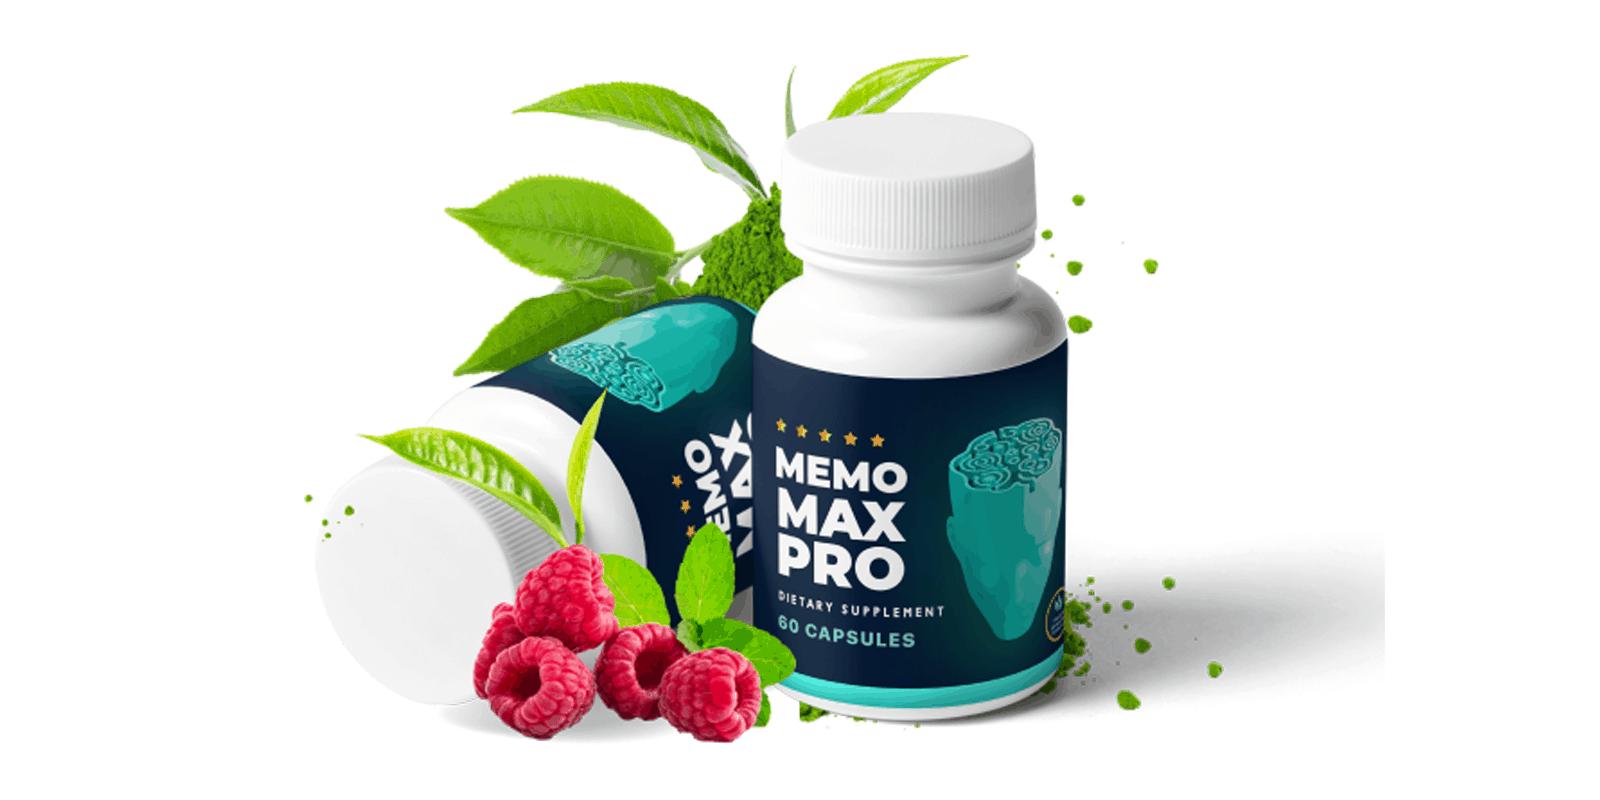 Memo Max Pro benefits